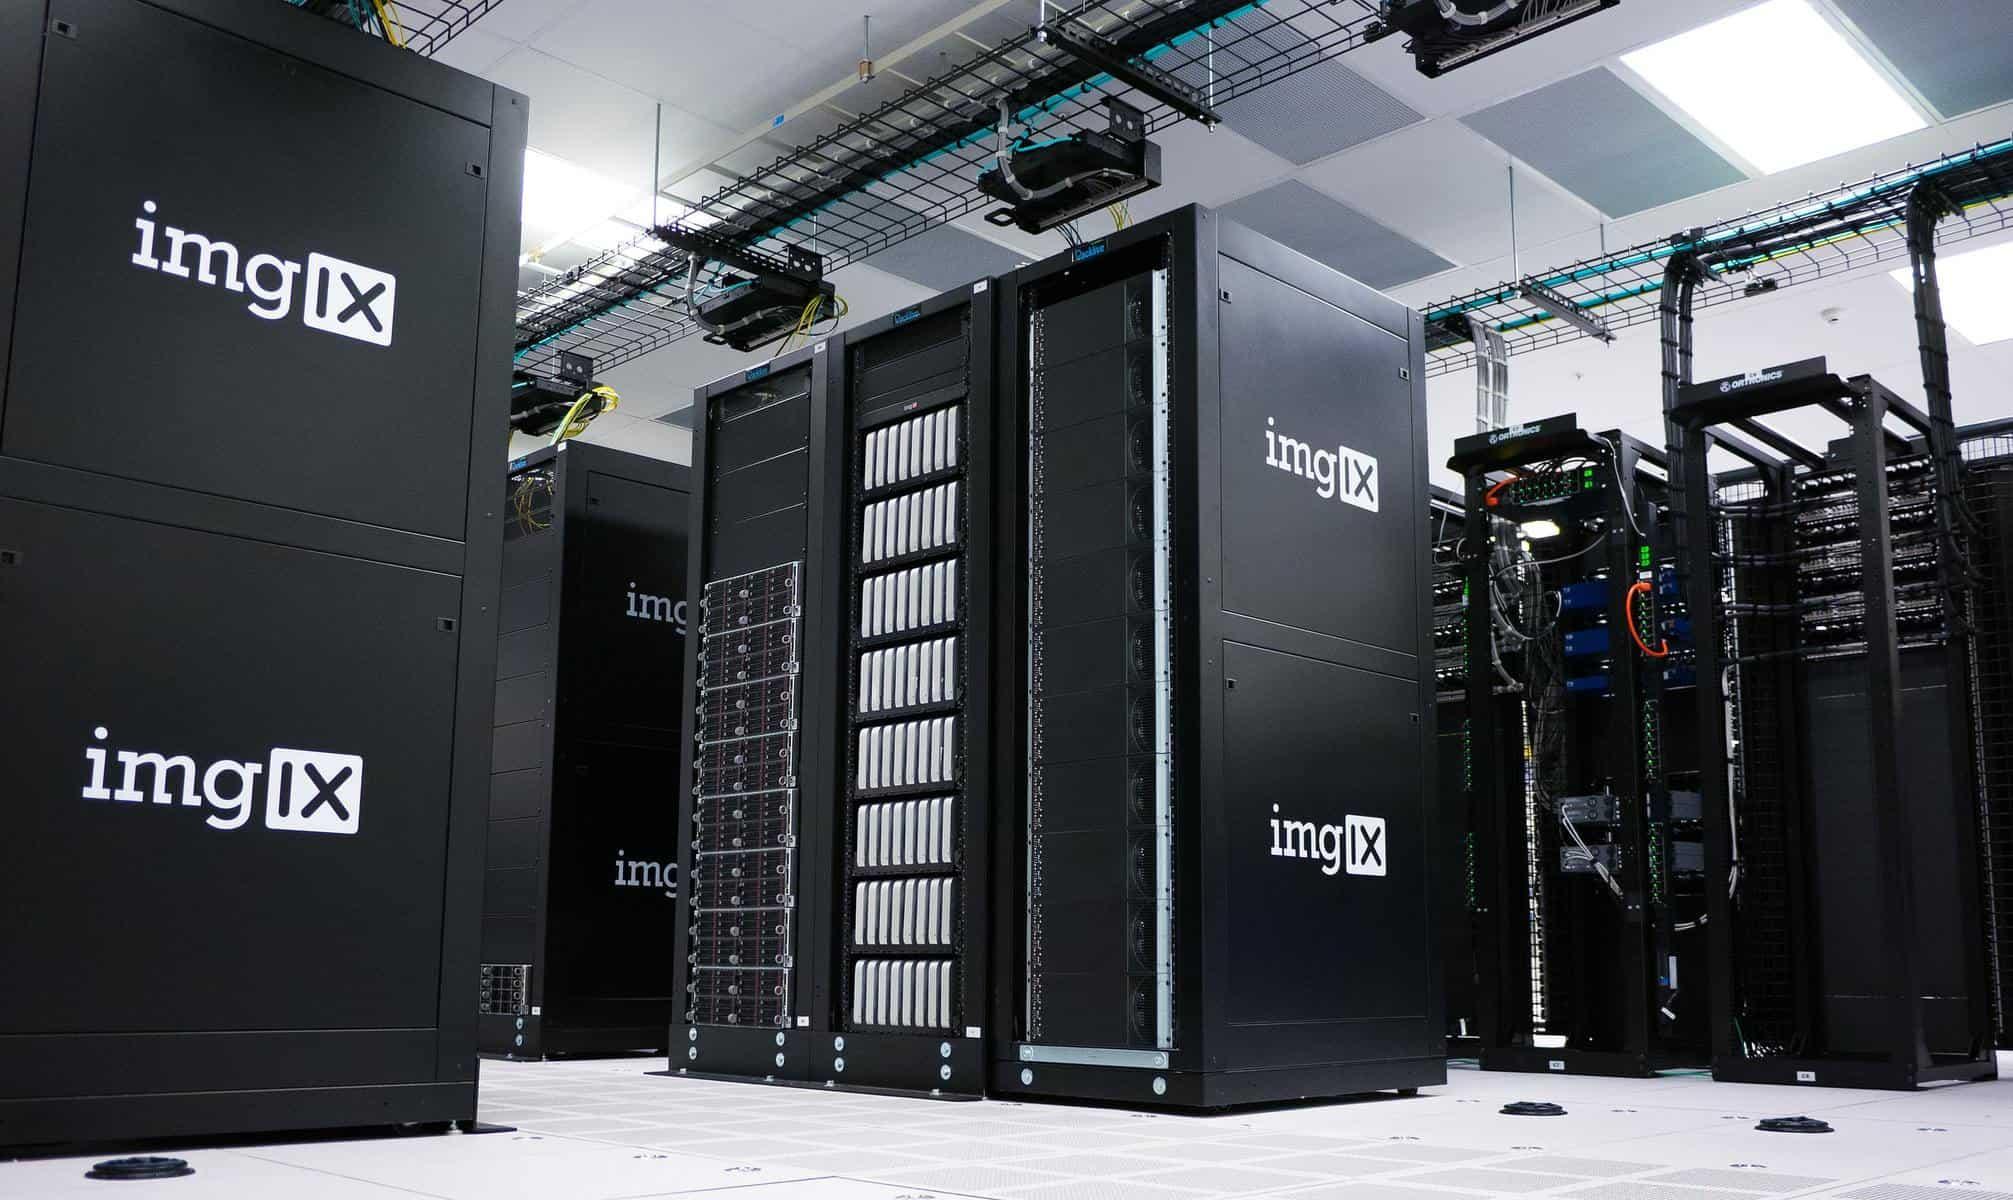 Big server room